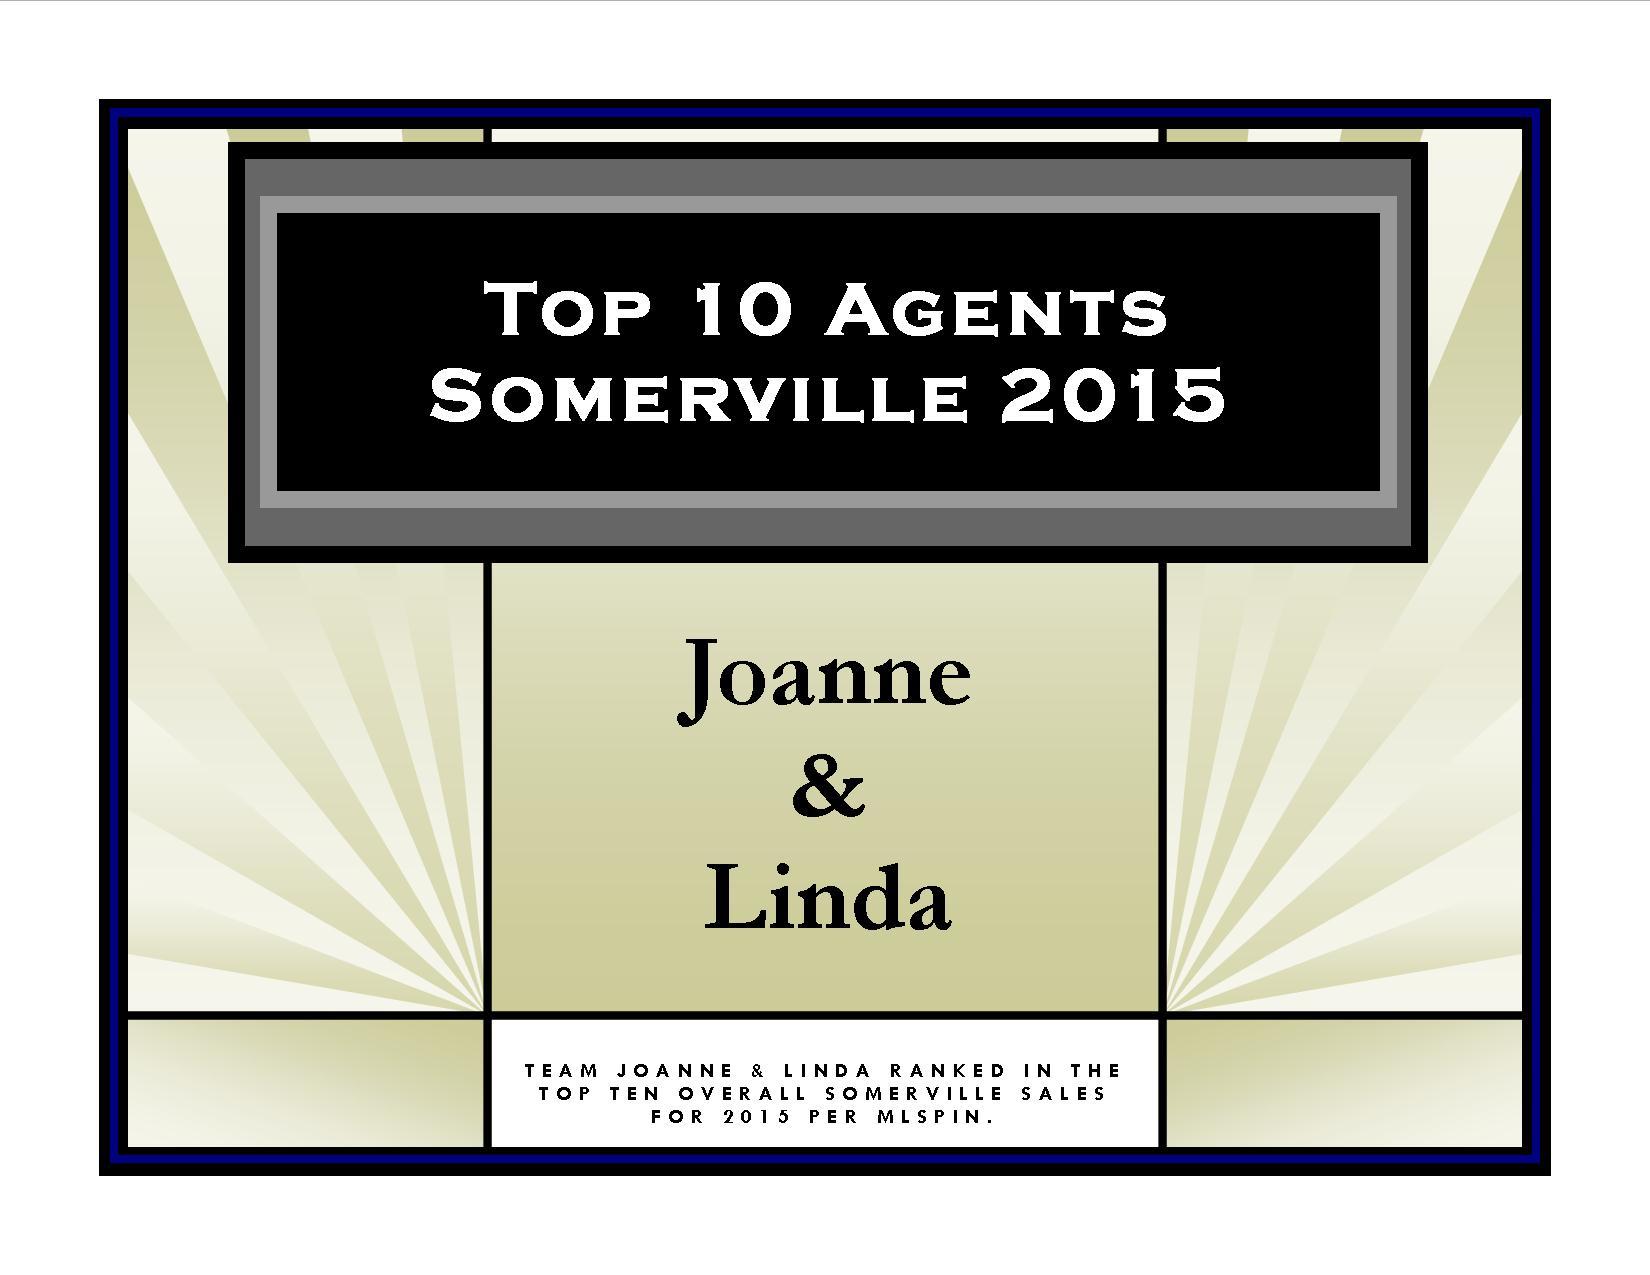 Top 10 Agents Somerville 2015